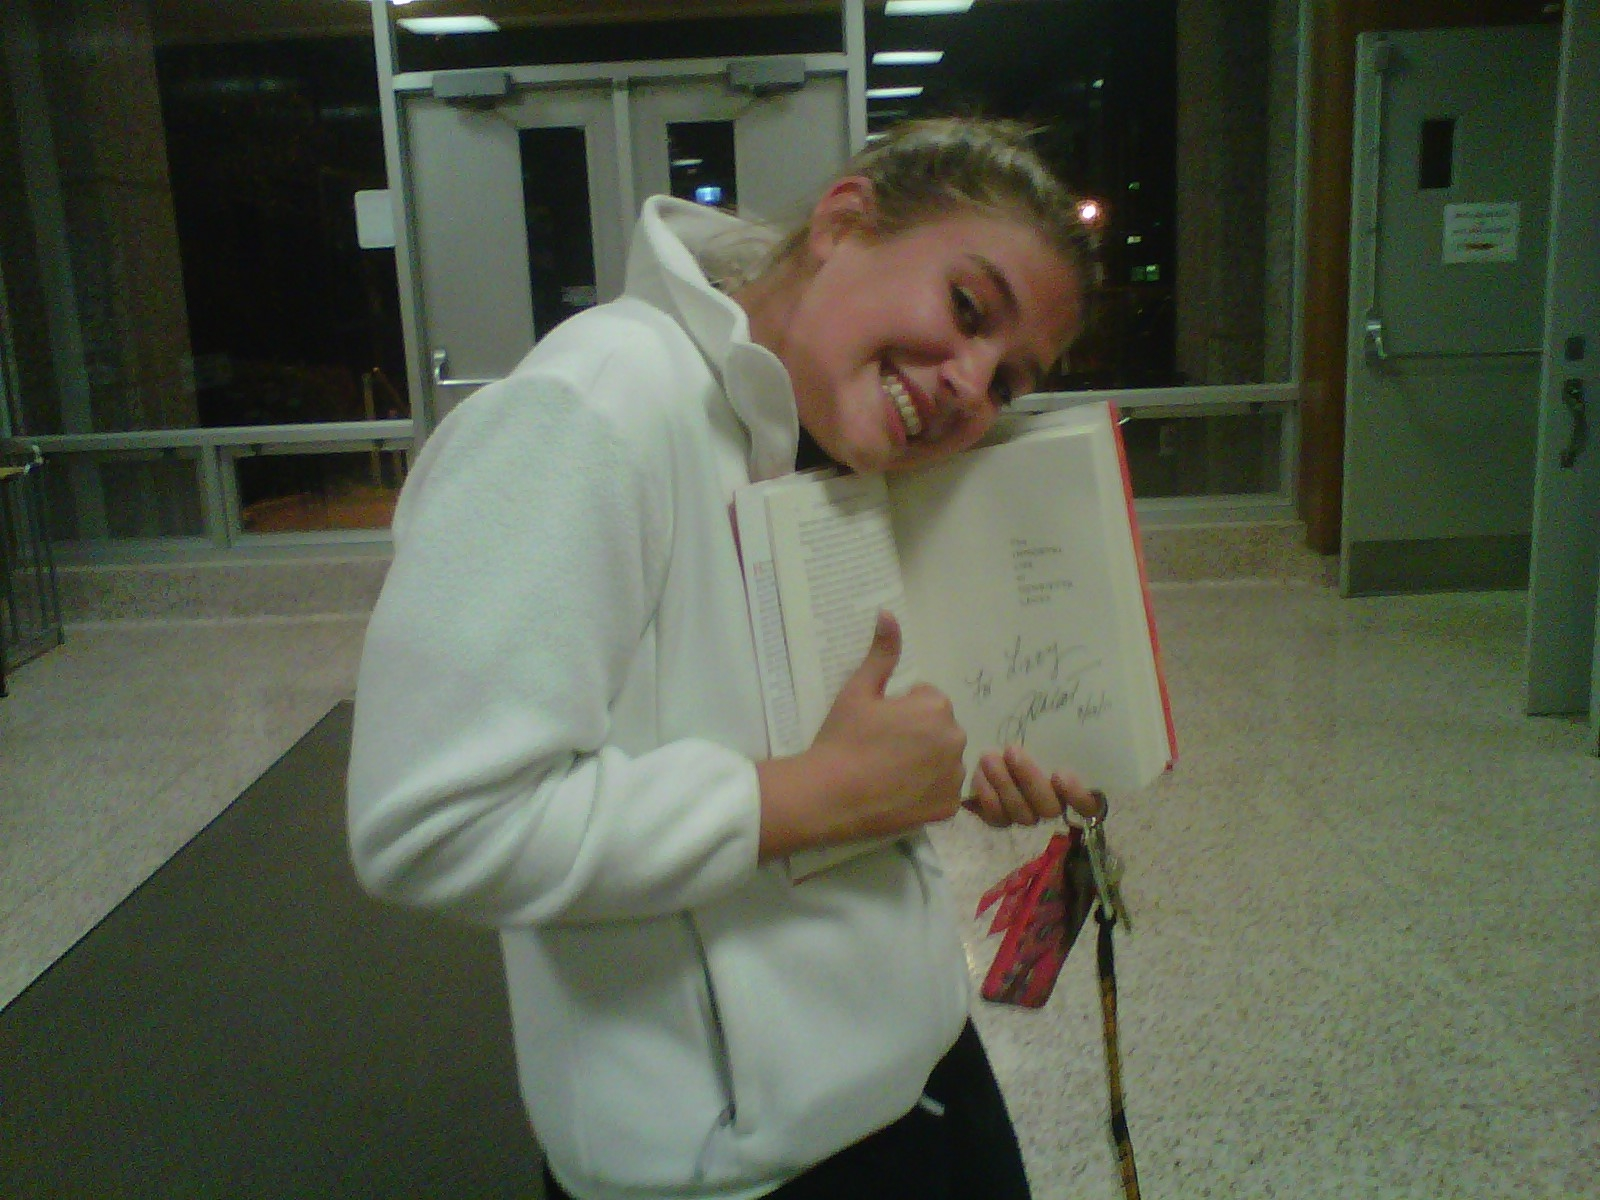 rebecca skloot st bonaventure freshman elizabeth johnson loves the immortal life of henrietta lacks